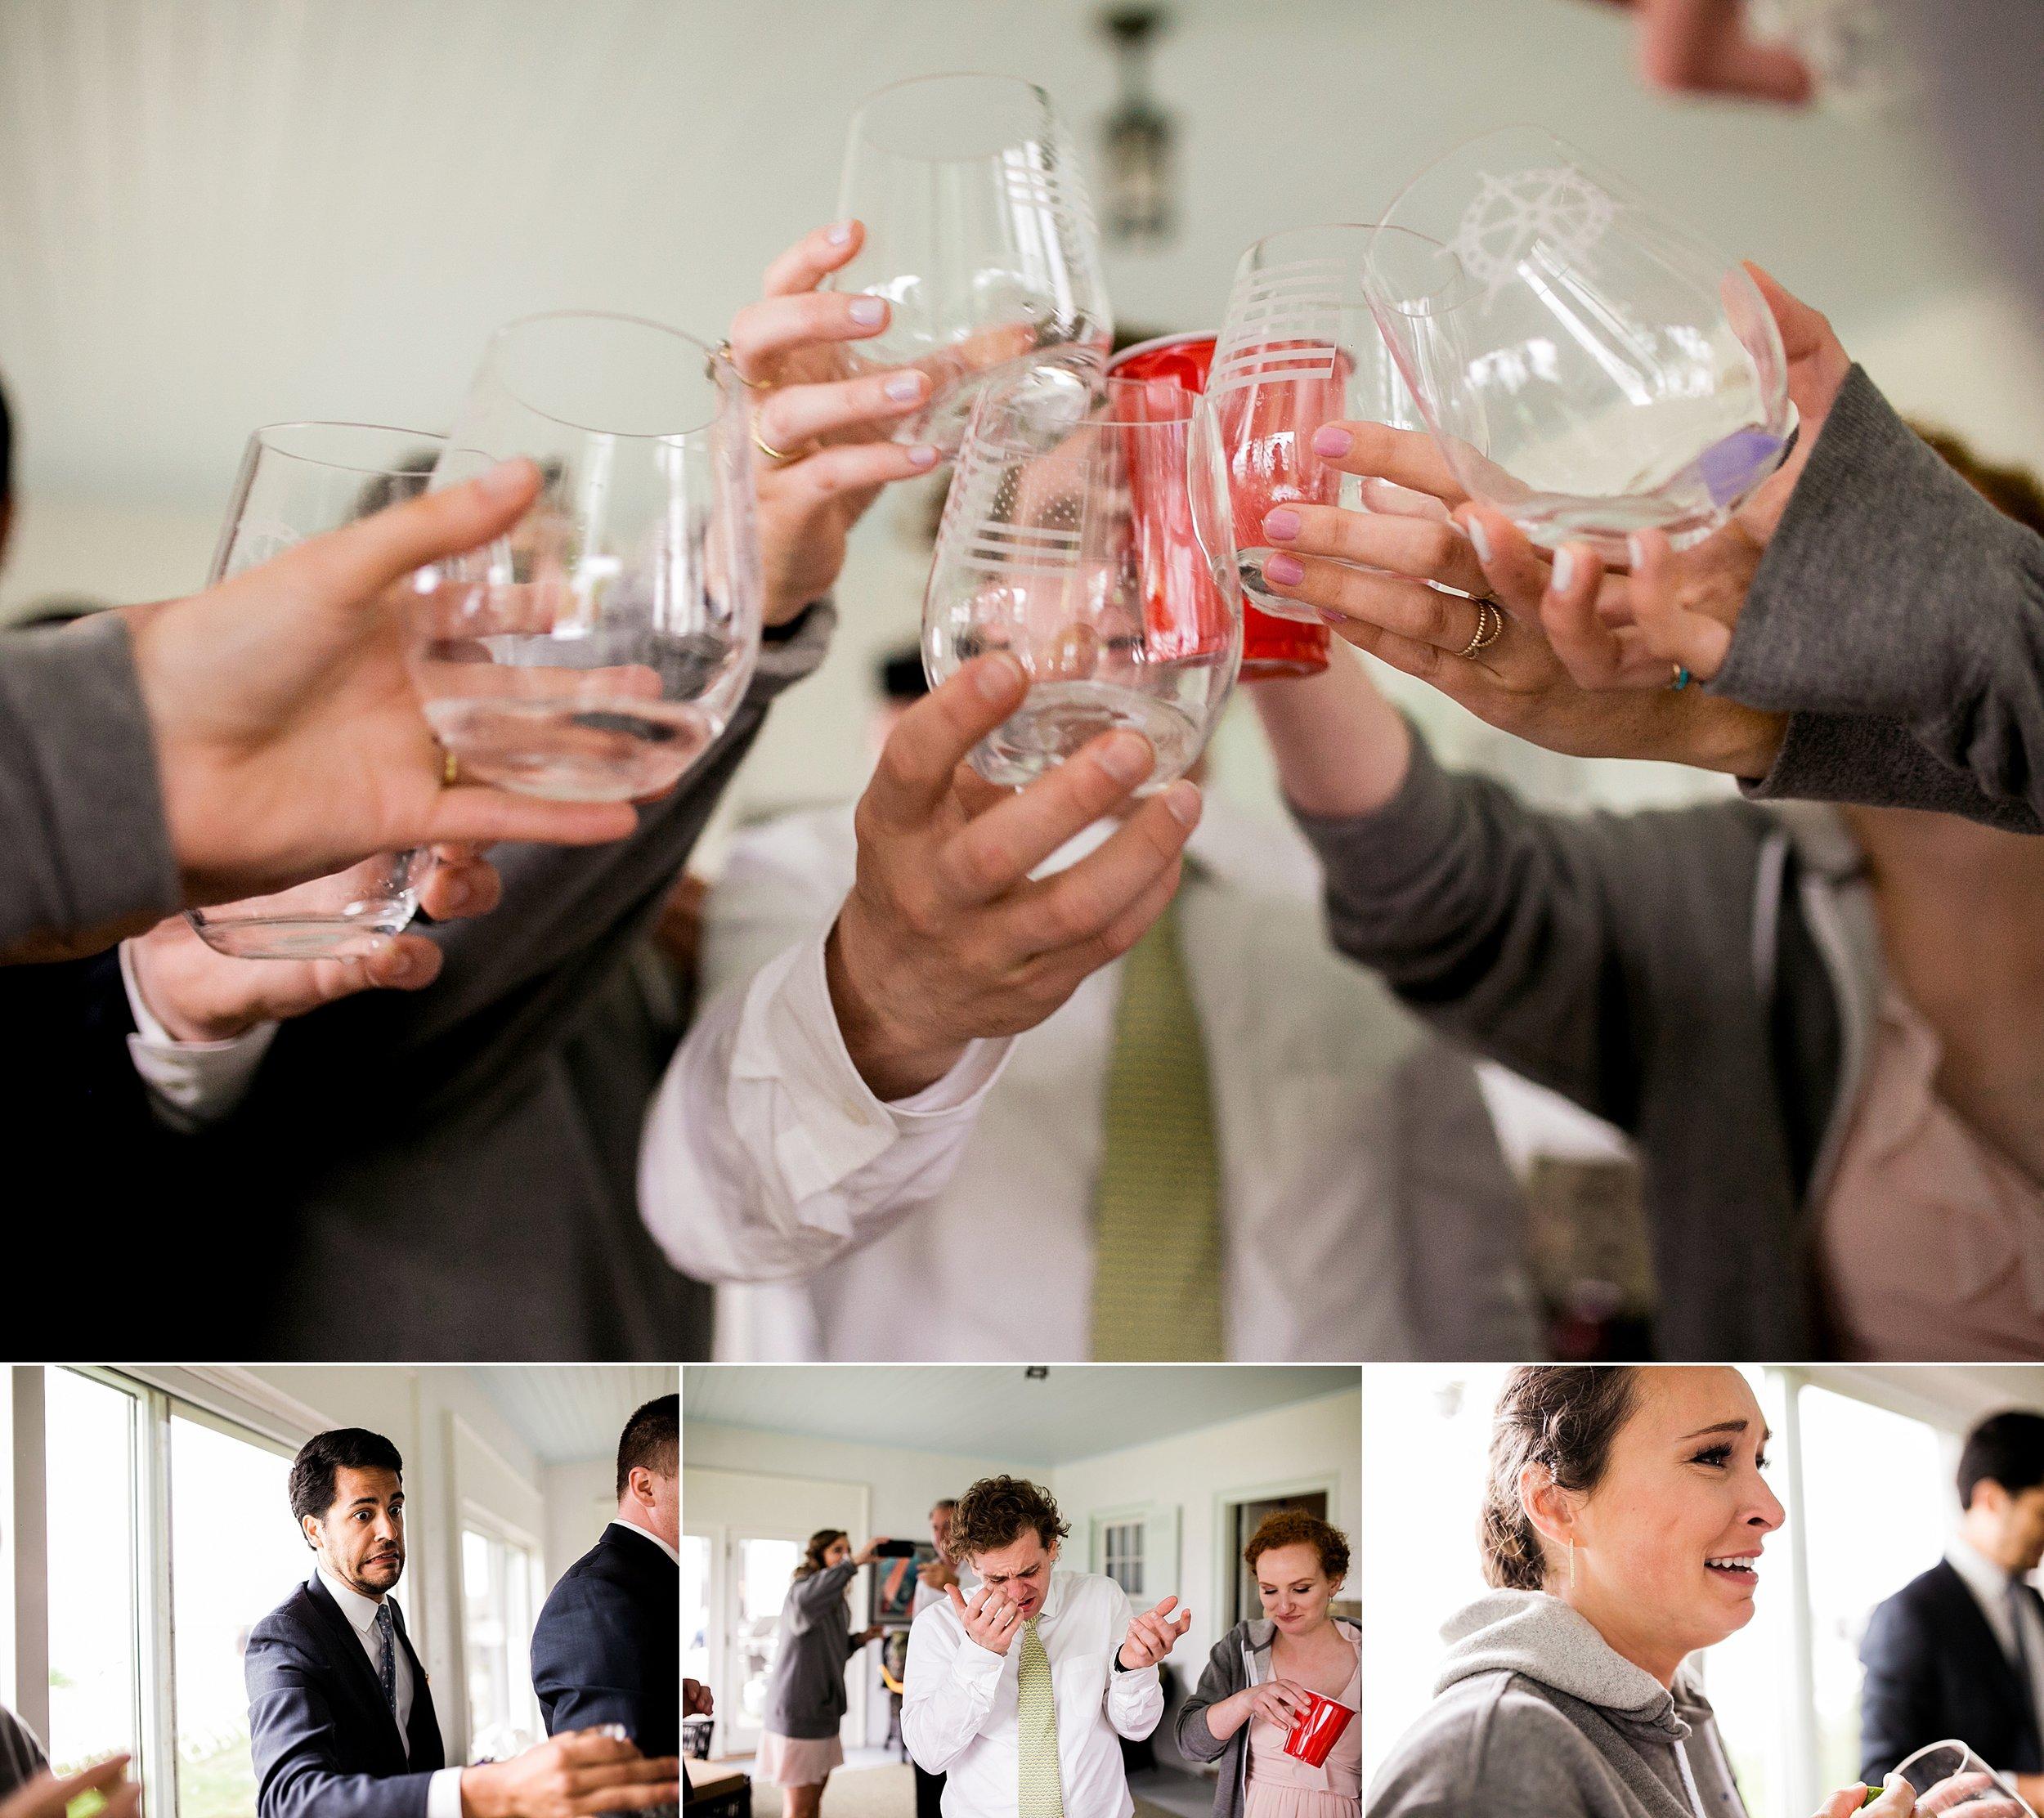 066 los angeles wedding photographer todd danforth photography cape cod.jpg